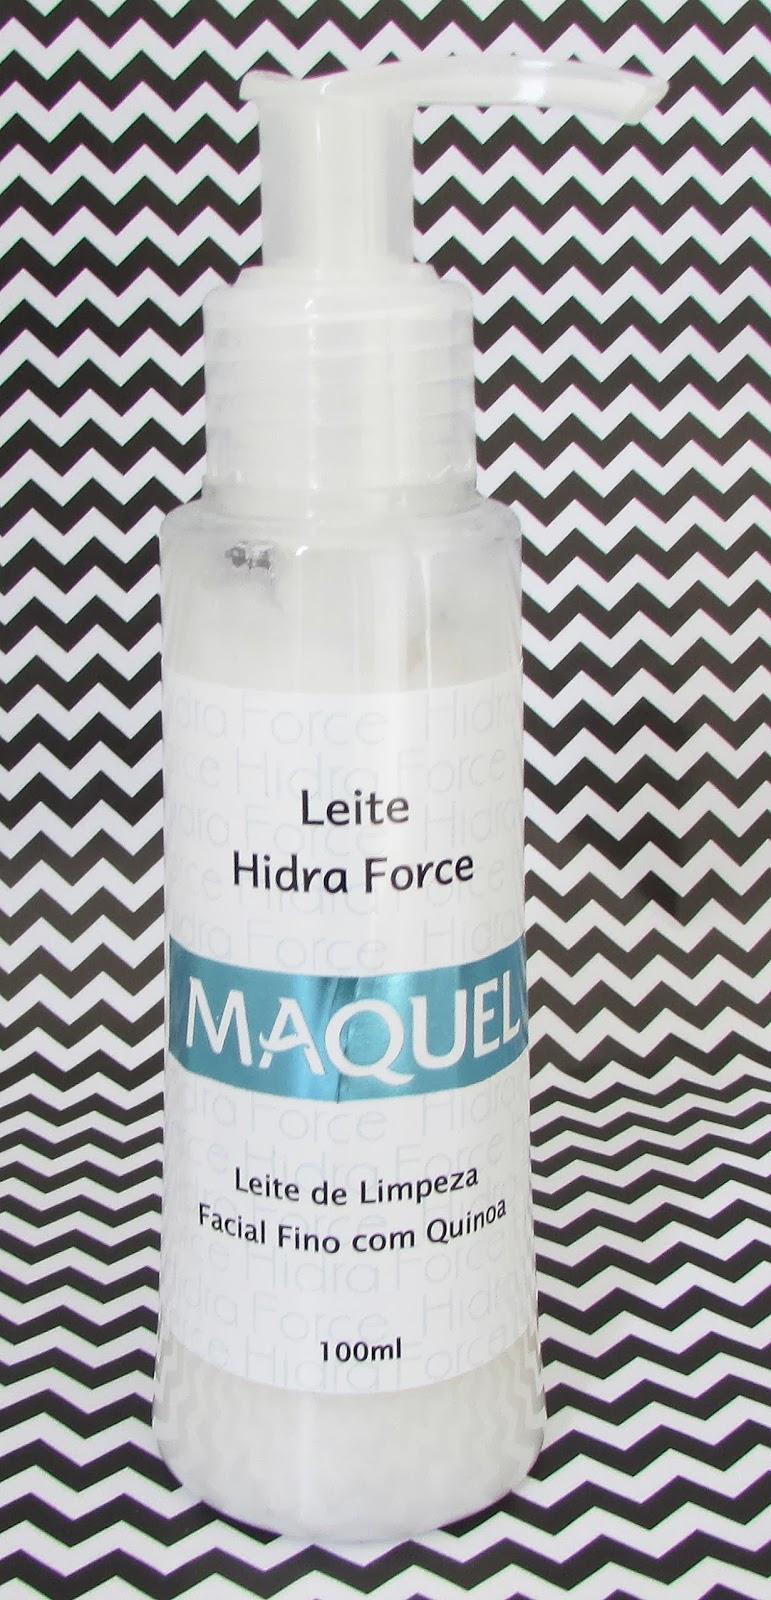 Resenha, Leite Hidra Force, Maquel